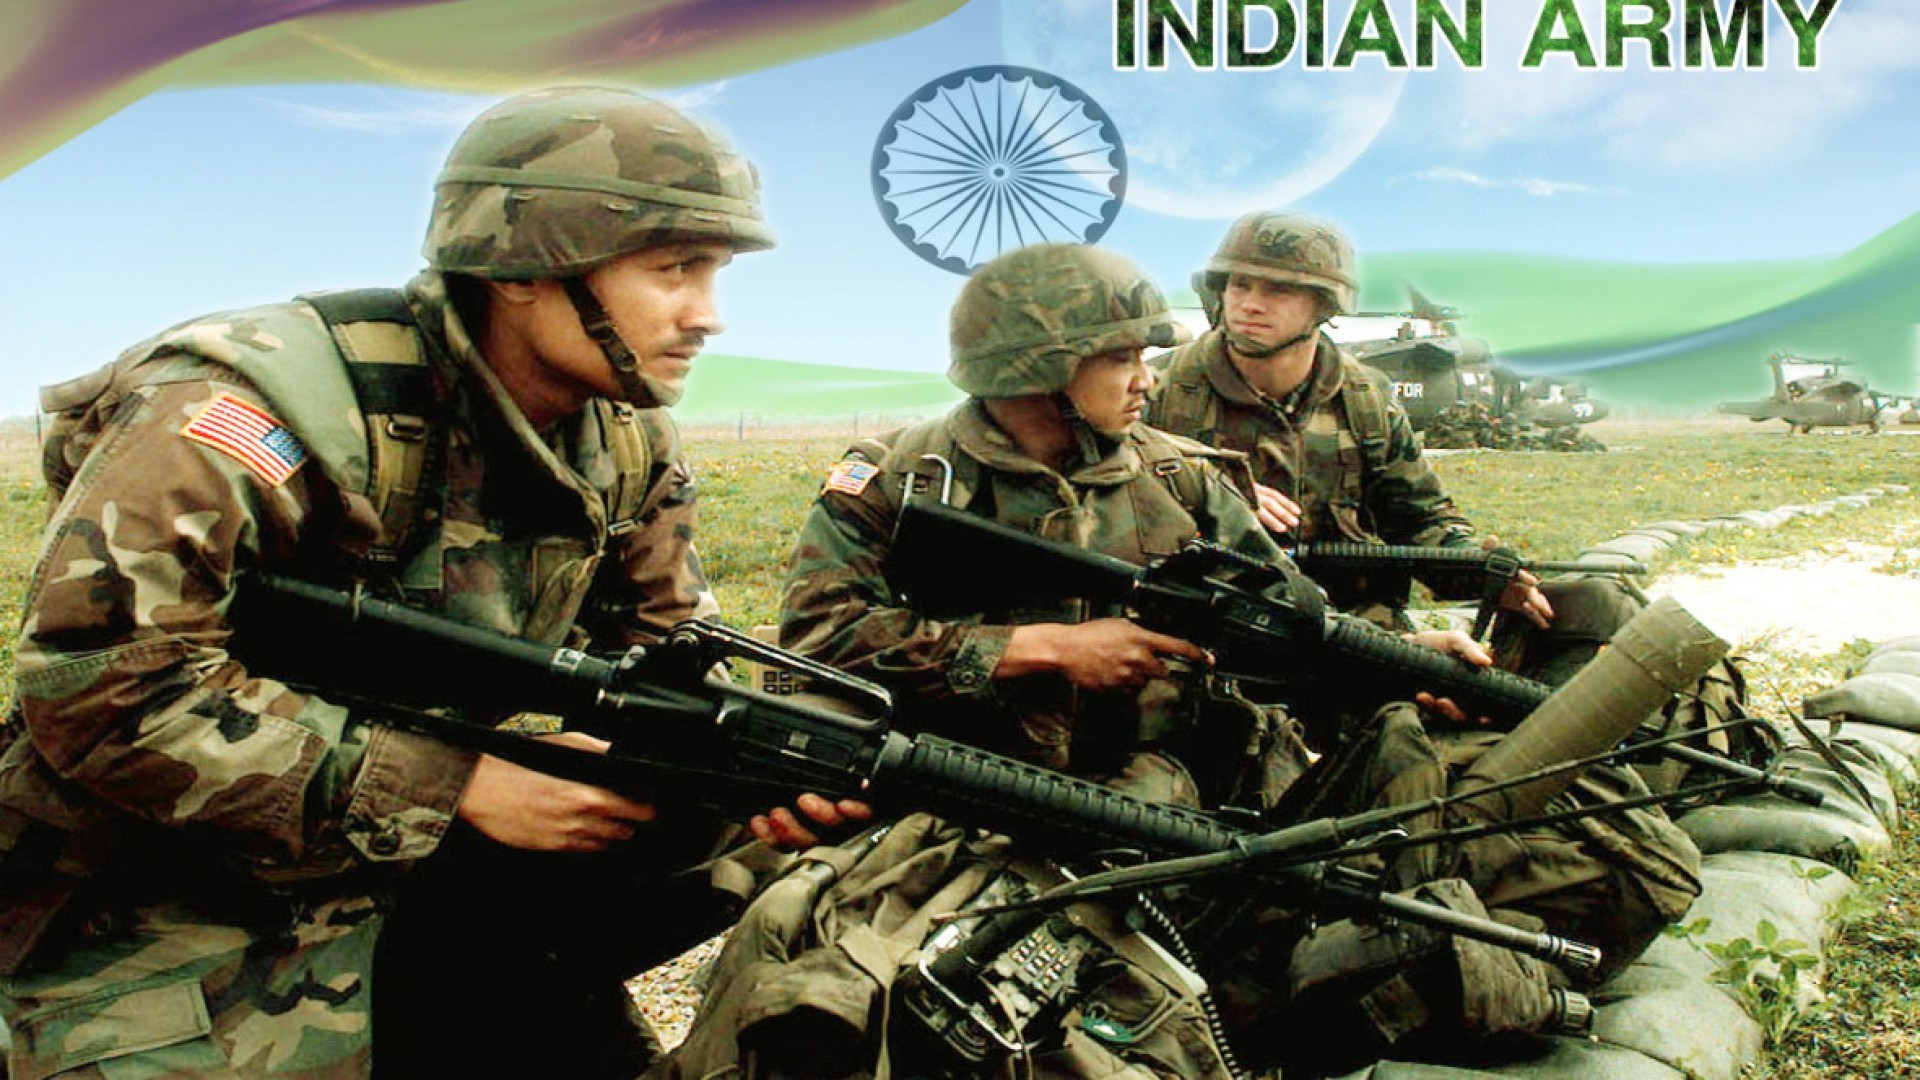 Indian army desktop hd wallpaper – HDWallpapersin.com